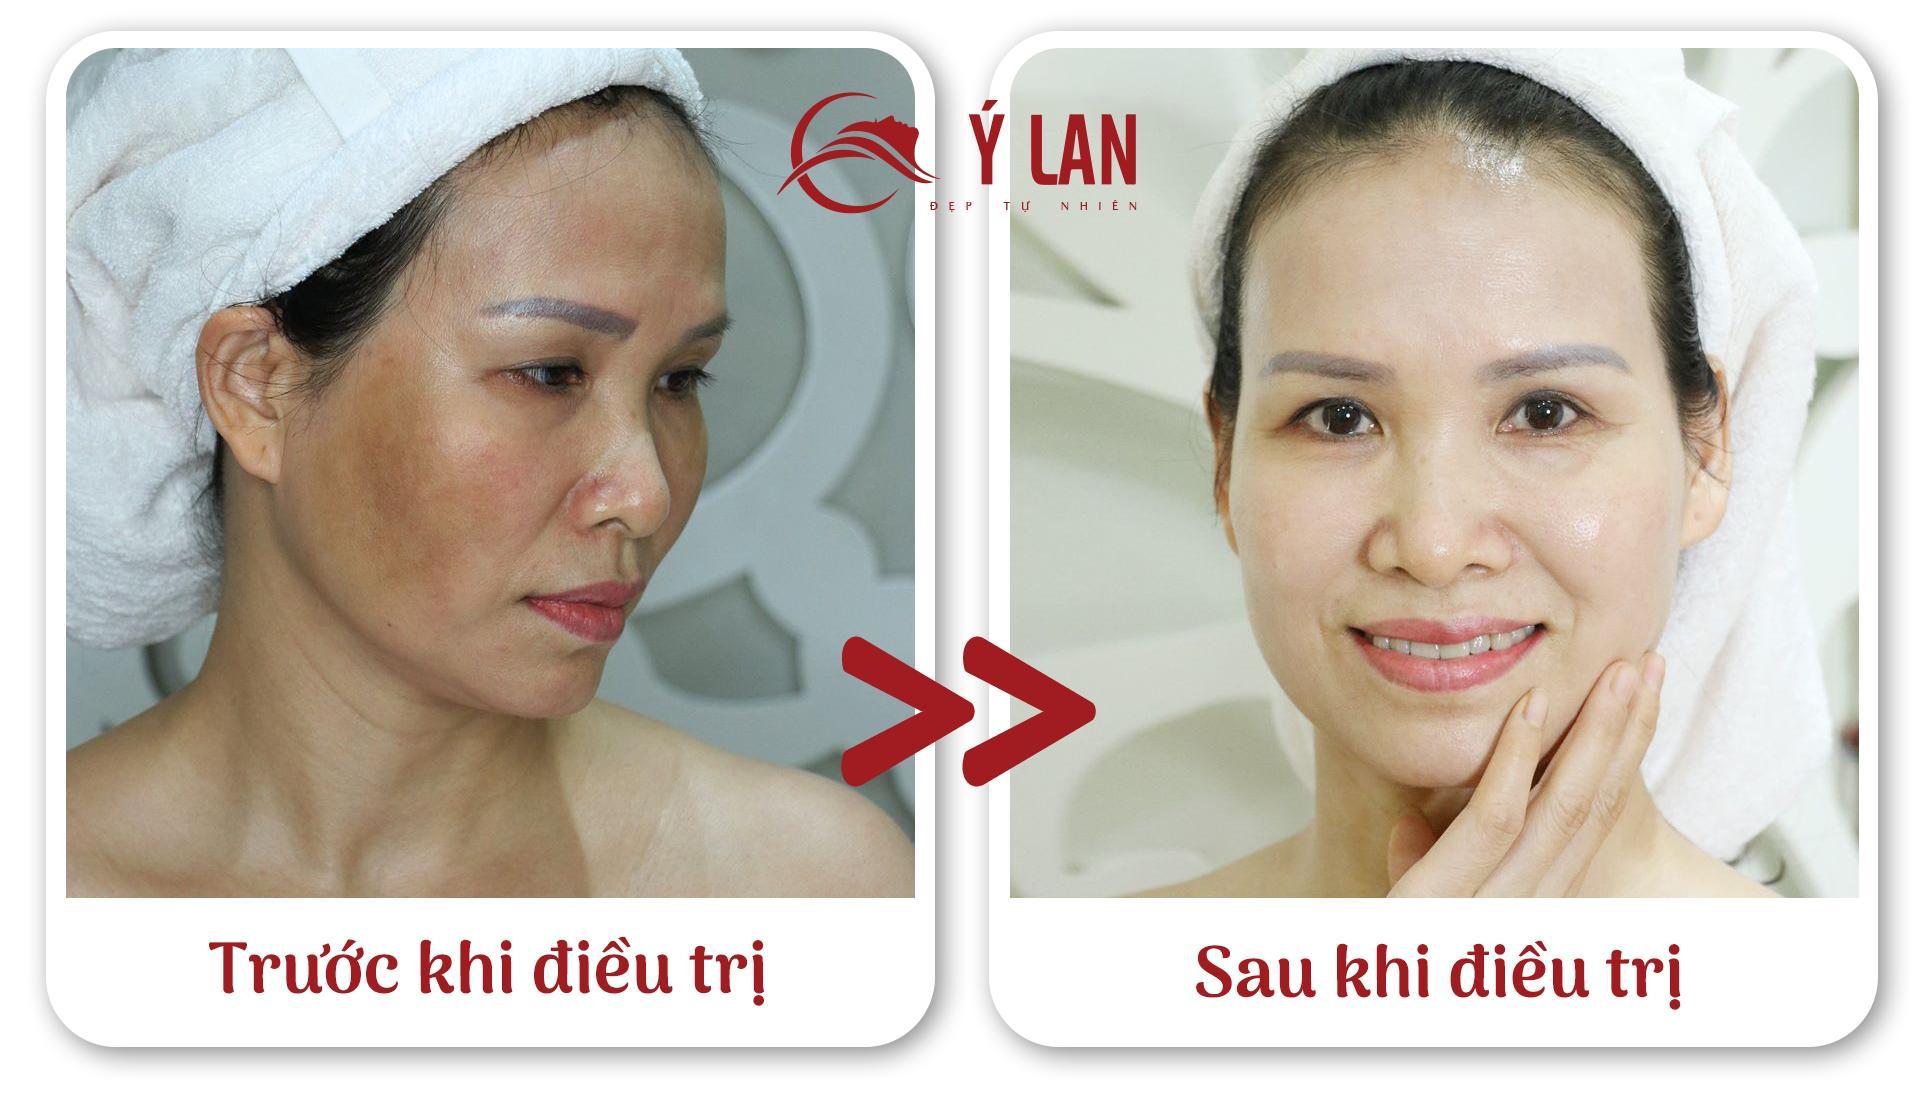 Nhan_Dien_Cac_Loai_Nam_Da_Va_Cach_Dieu_Tri_Hieu_Qua